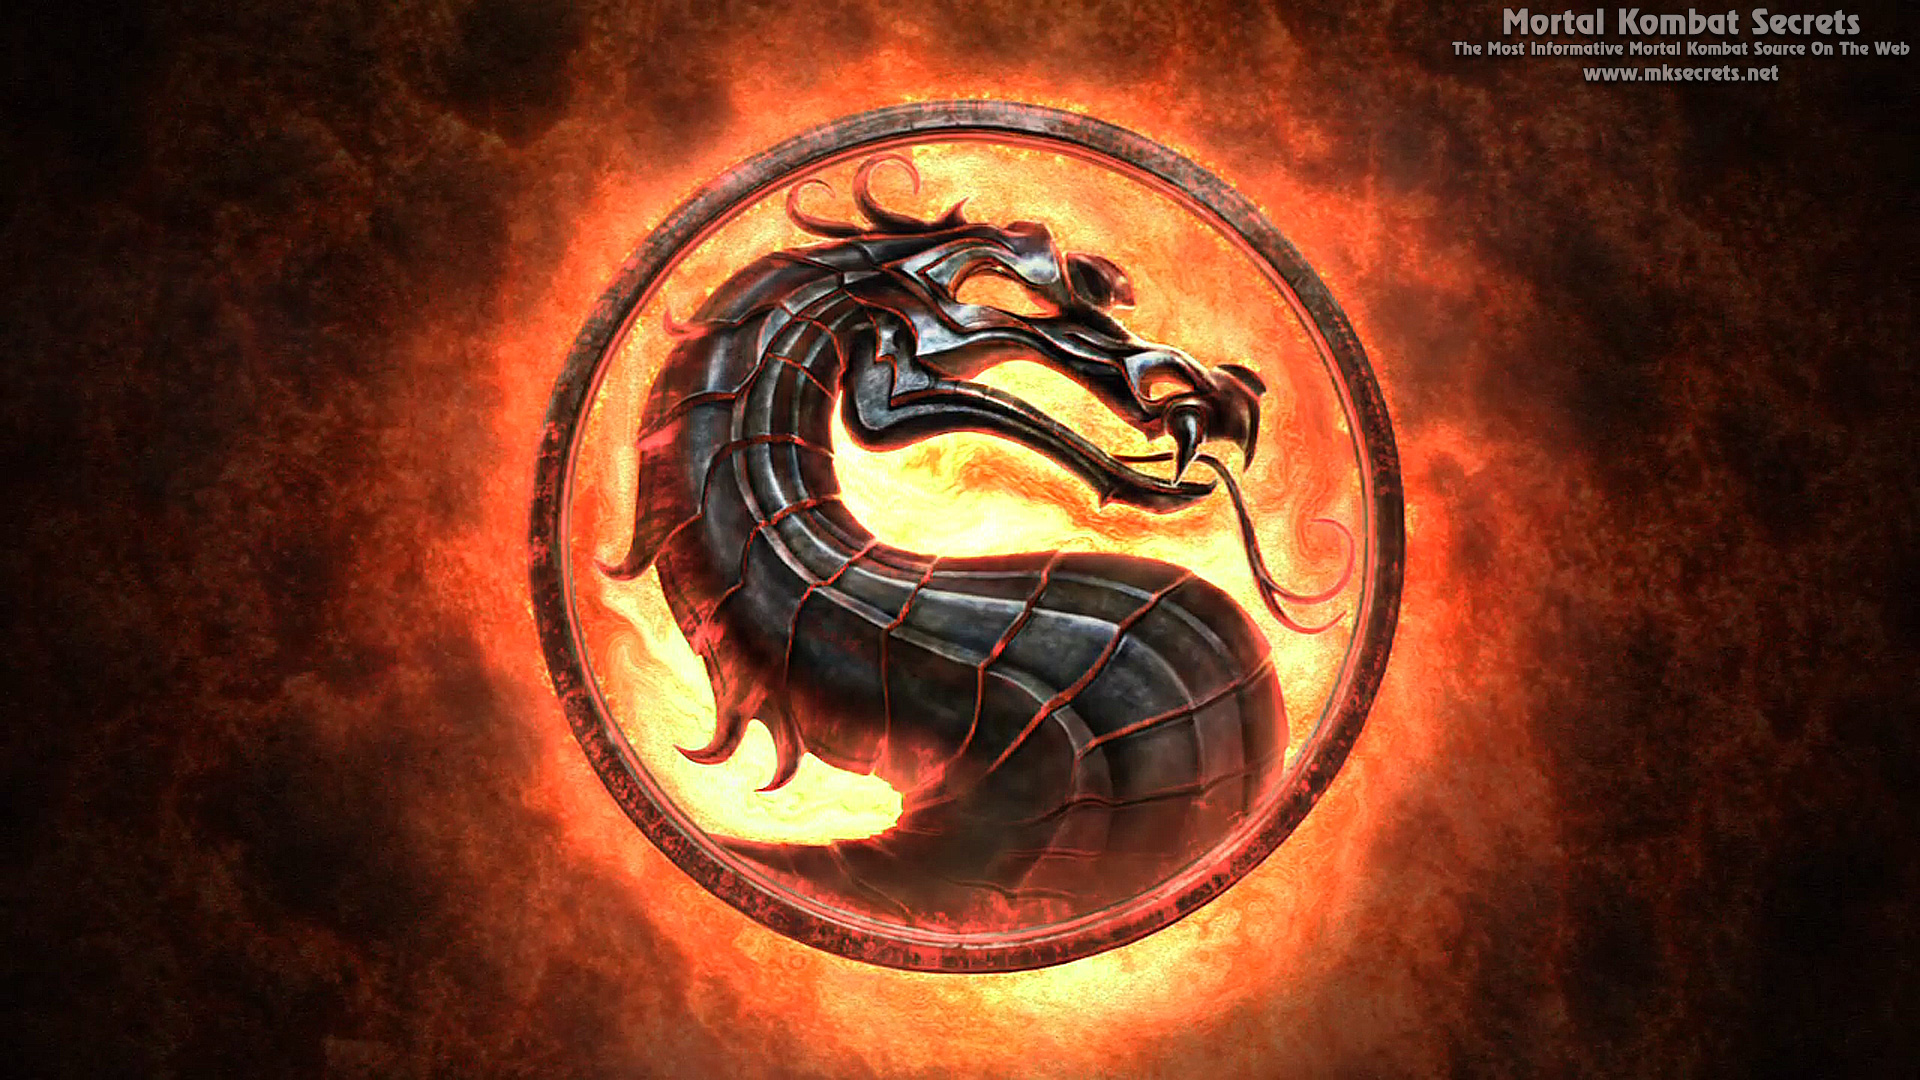 Mortal Kombat 9 2011   Wallpapers   Mortal Kombat Secrets 1920x1080